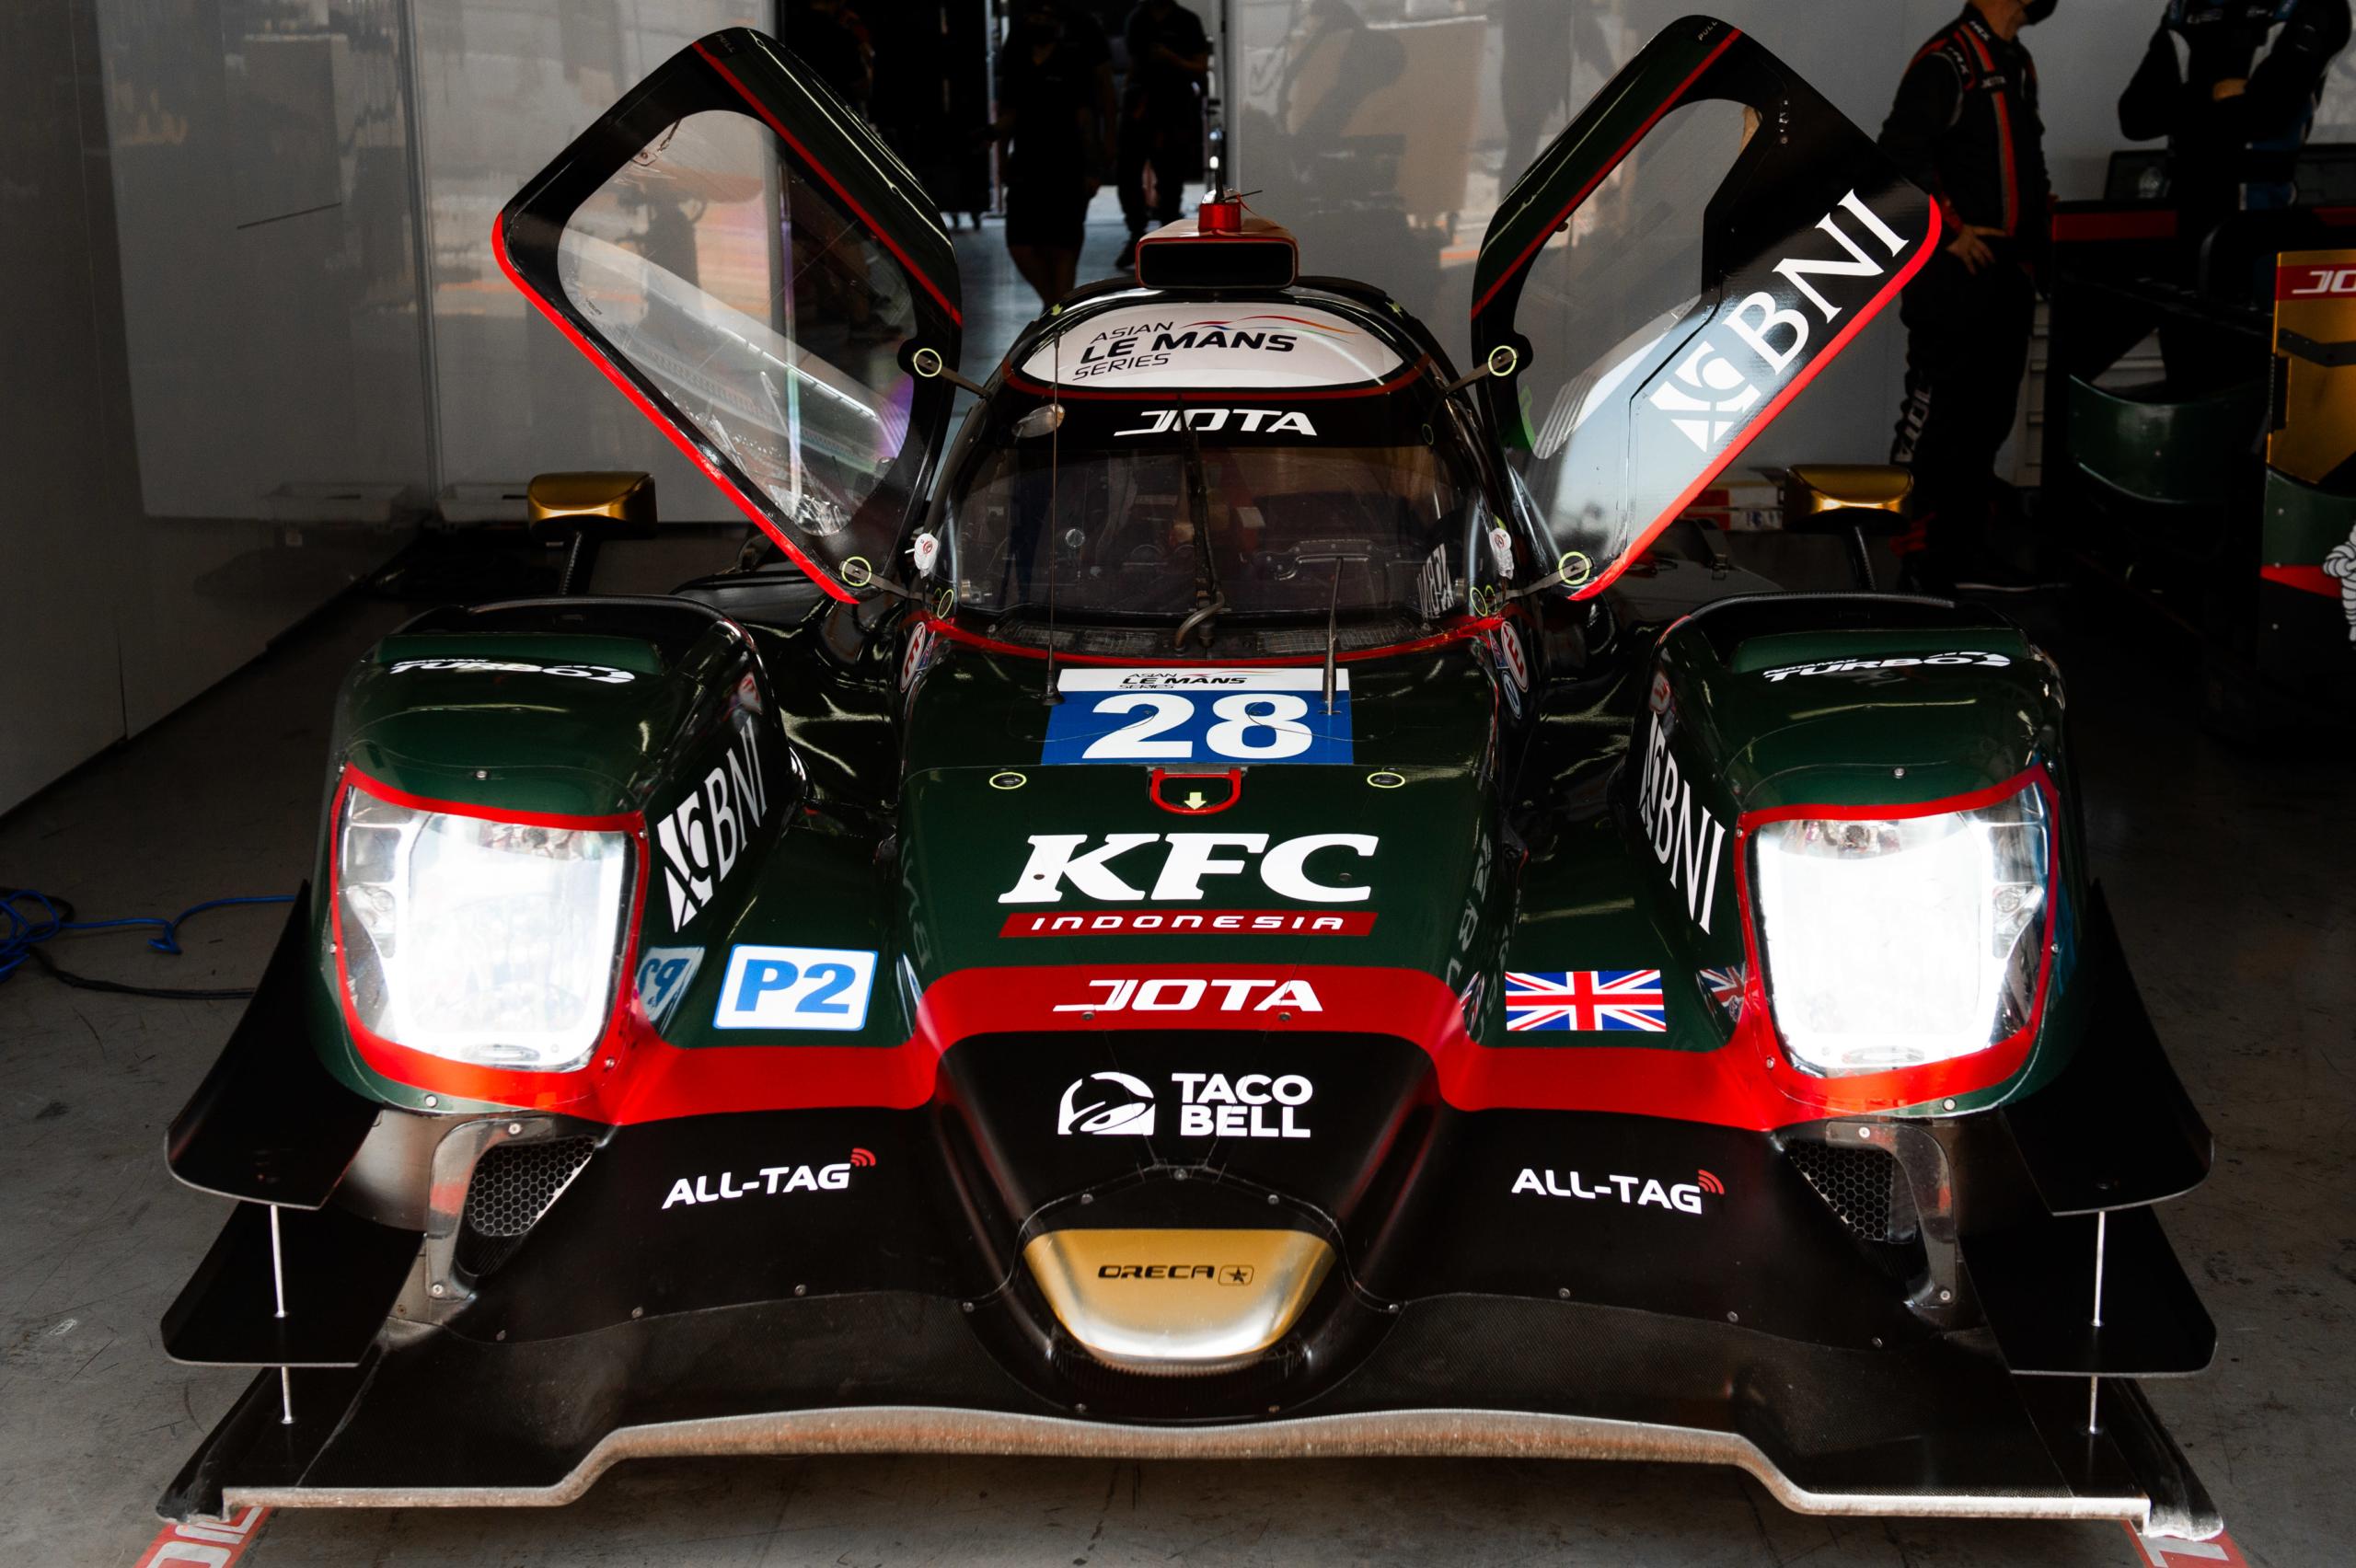 Alltag car sponsor